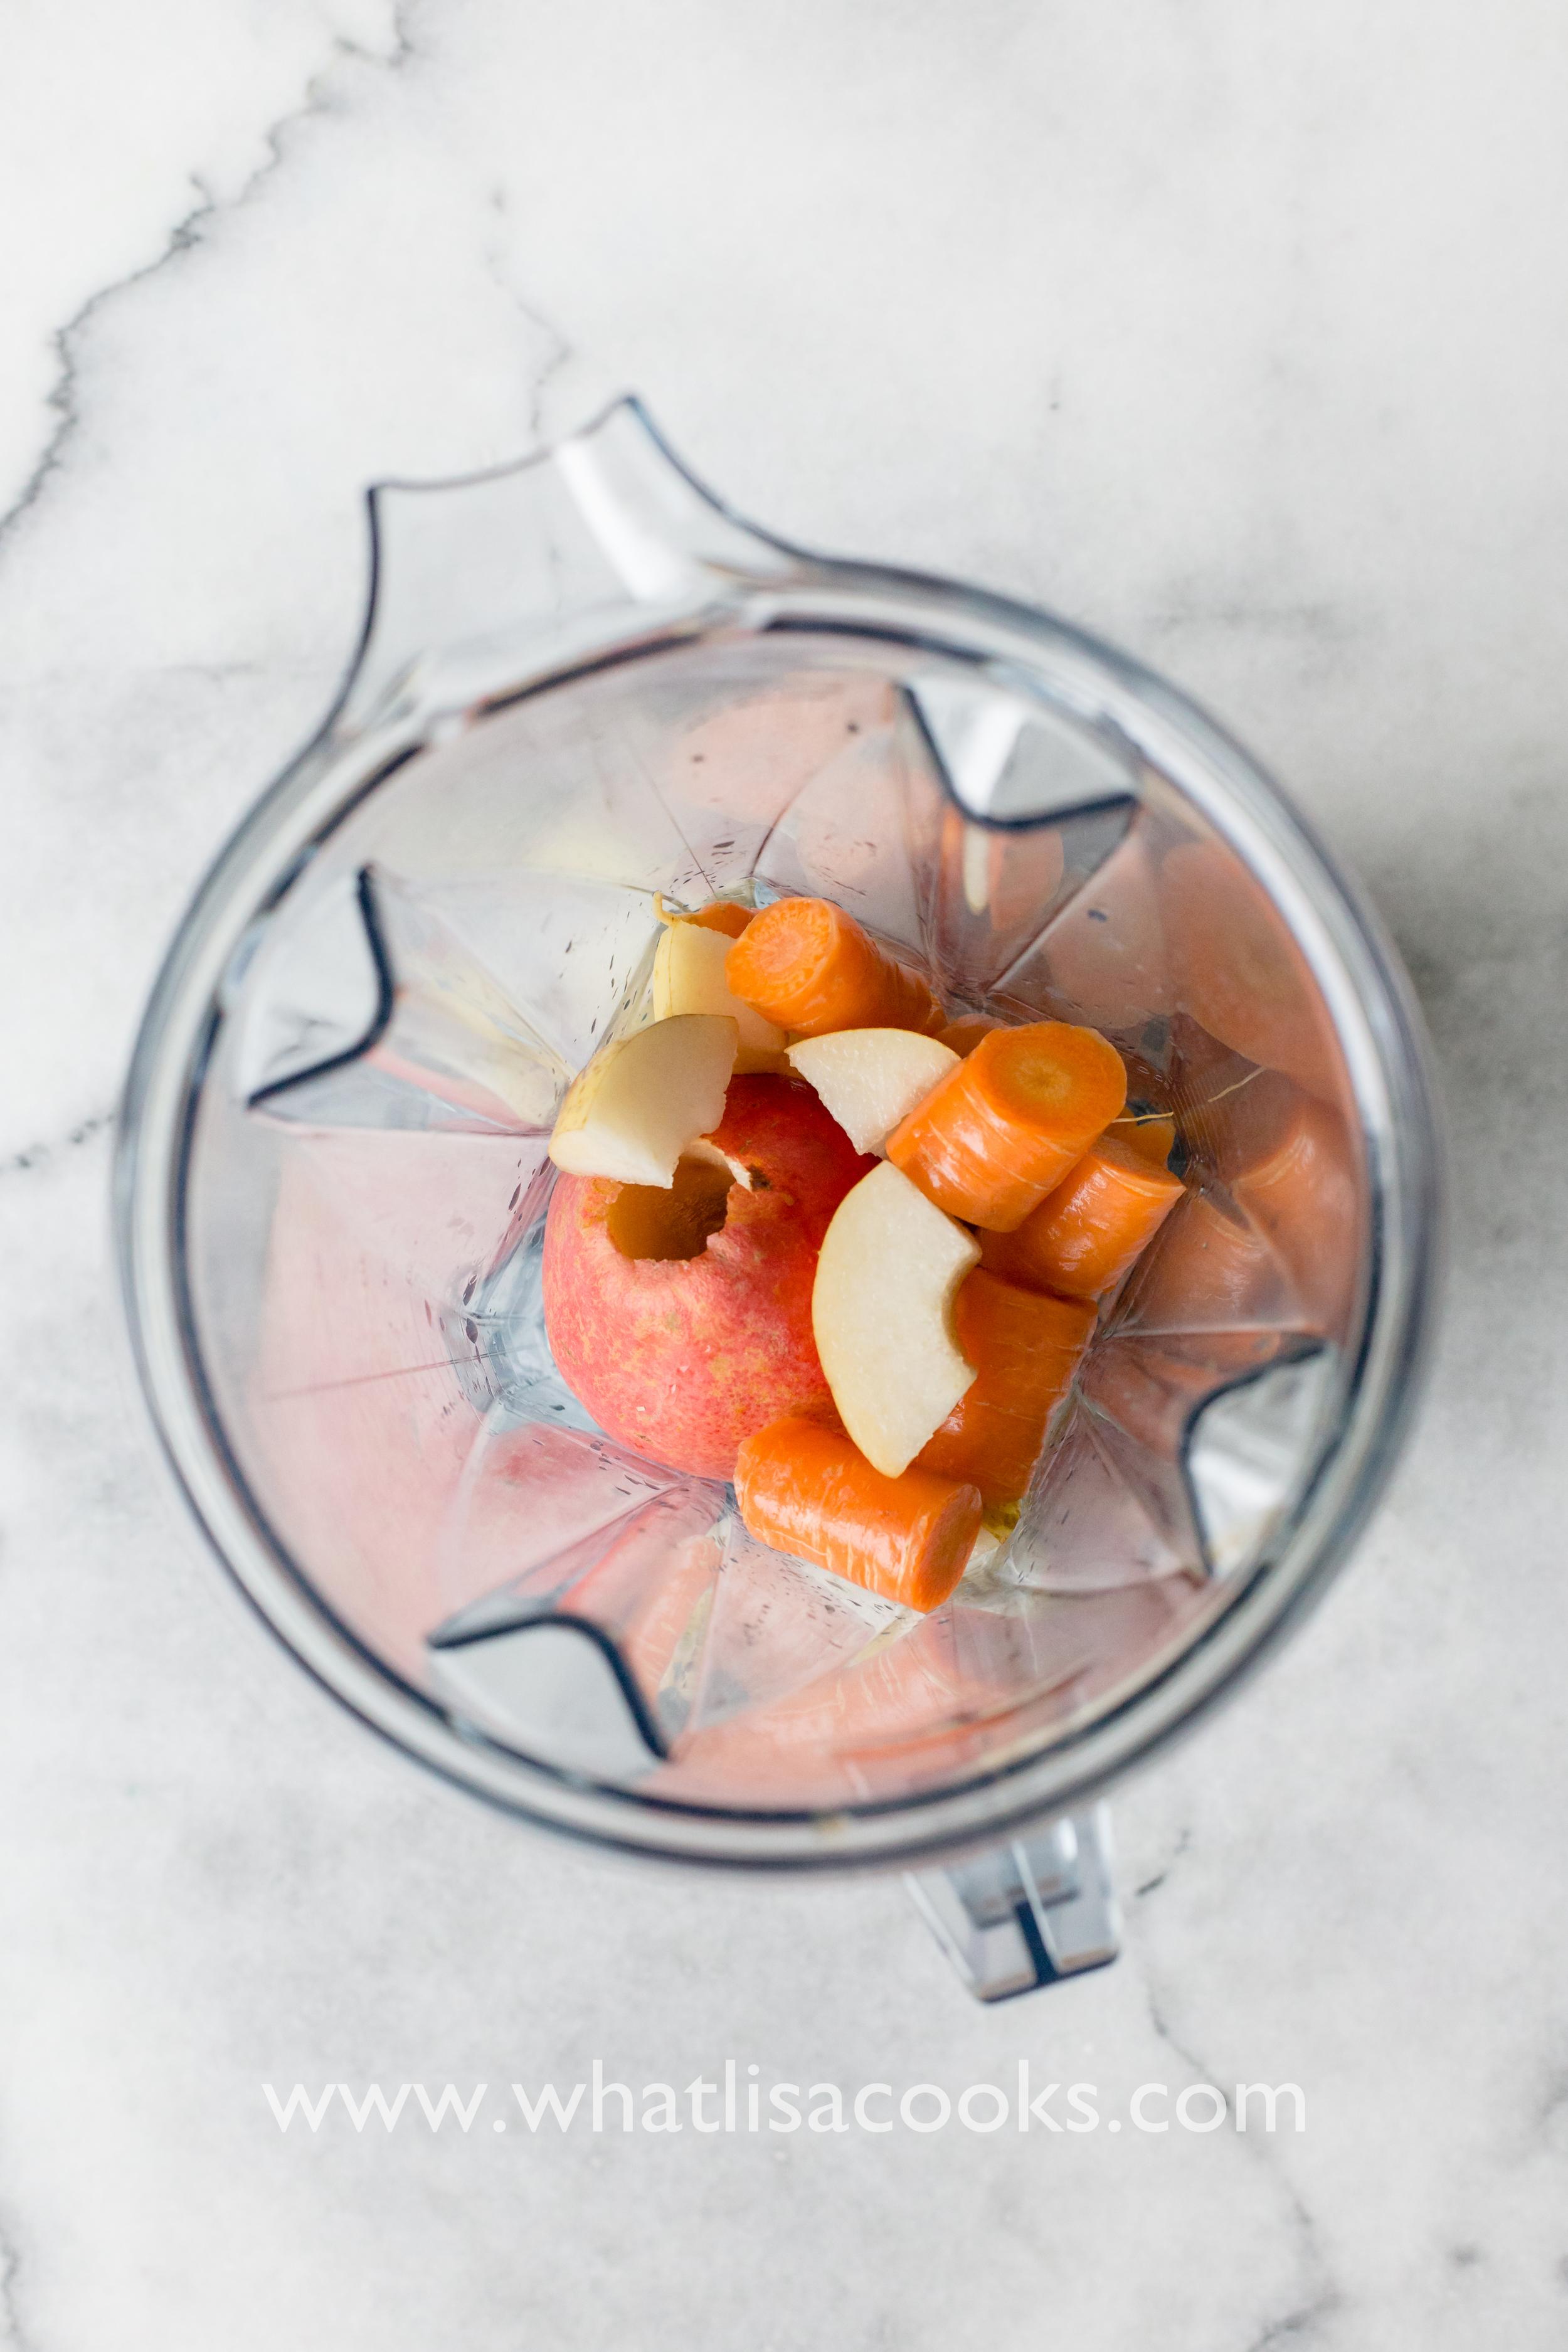 Carrots & Pears